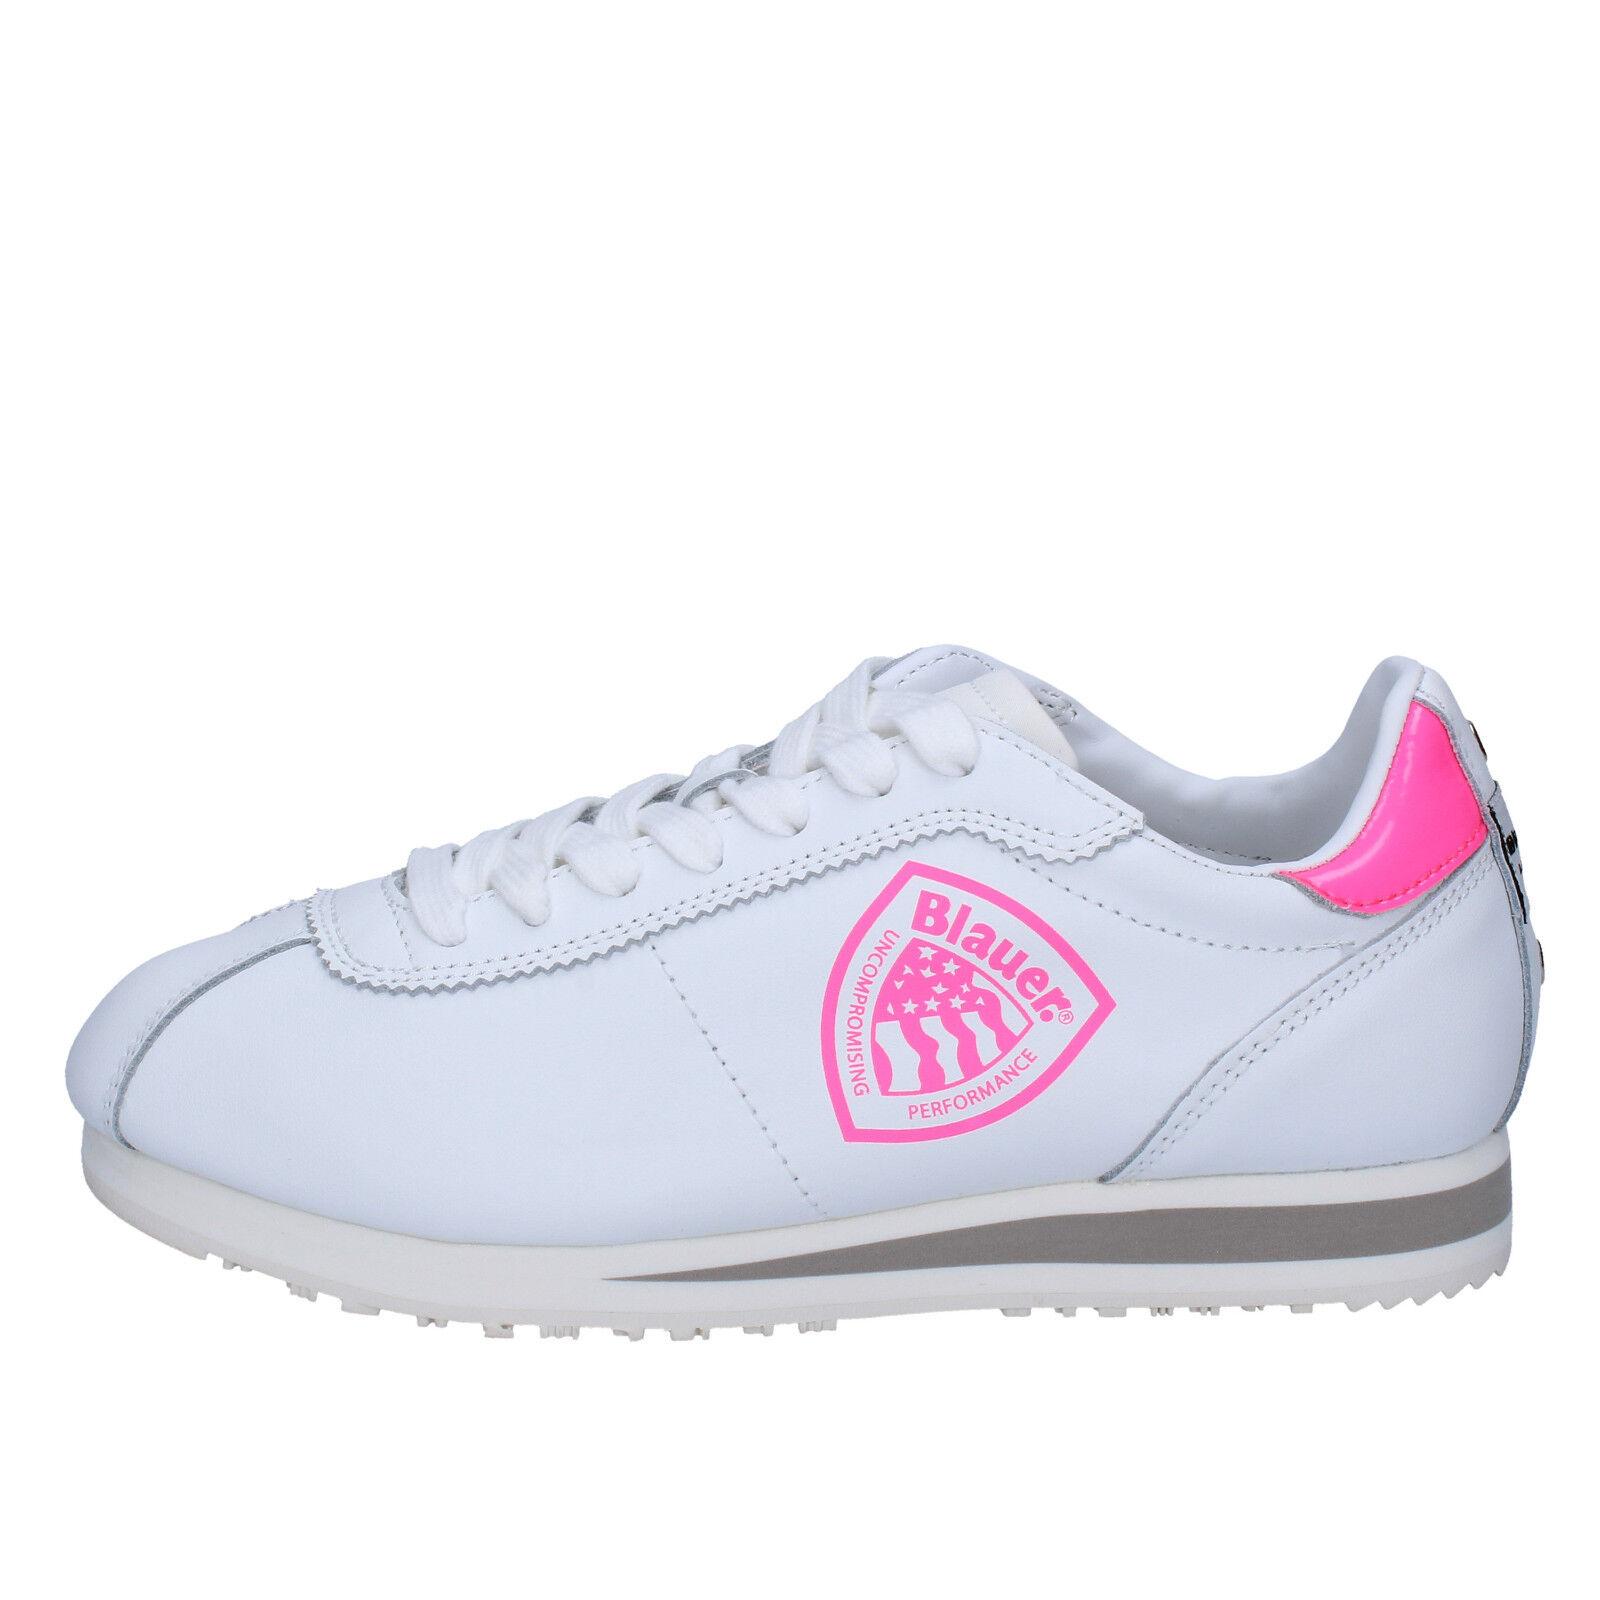 Scarpe donna BLAUER USA USA BLAUER pelle 37 scarpe da ginnastica bianco rosa pelle USA   90378a